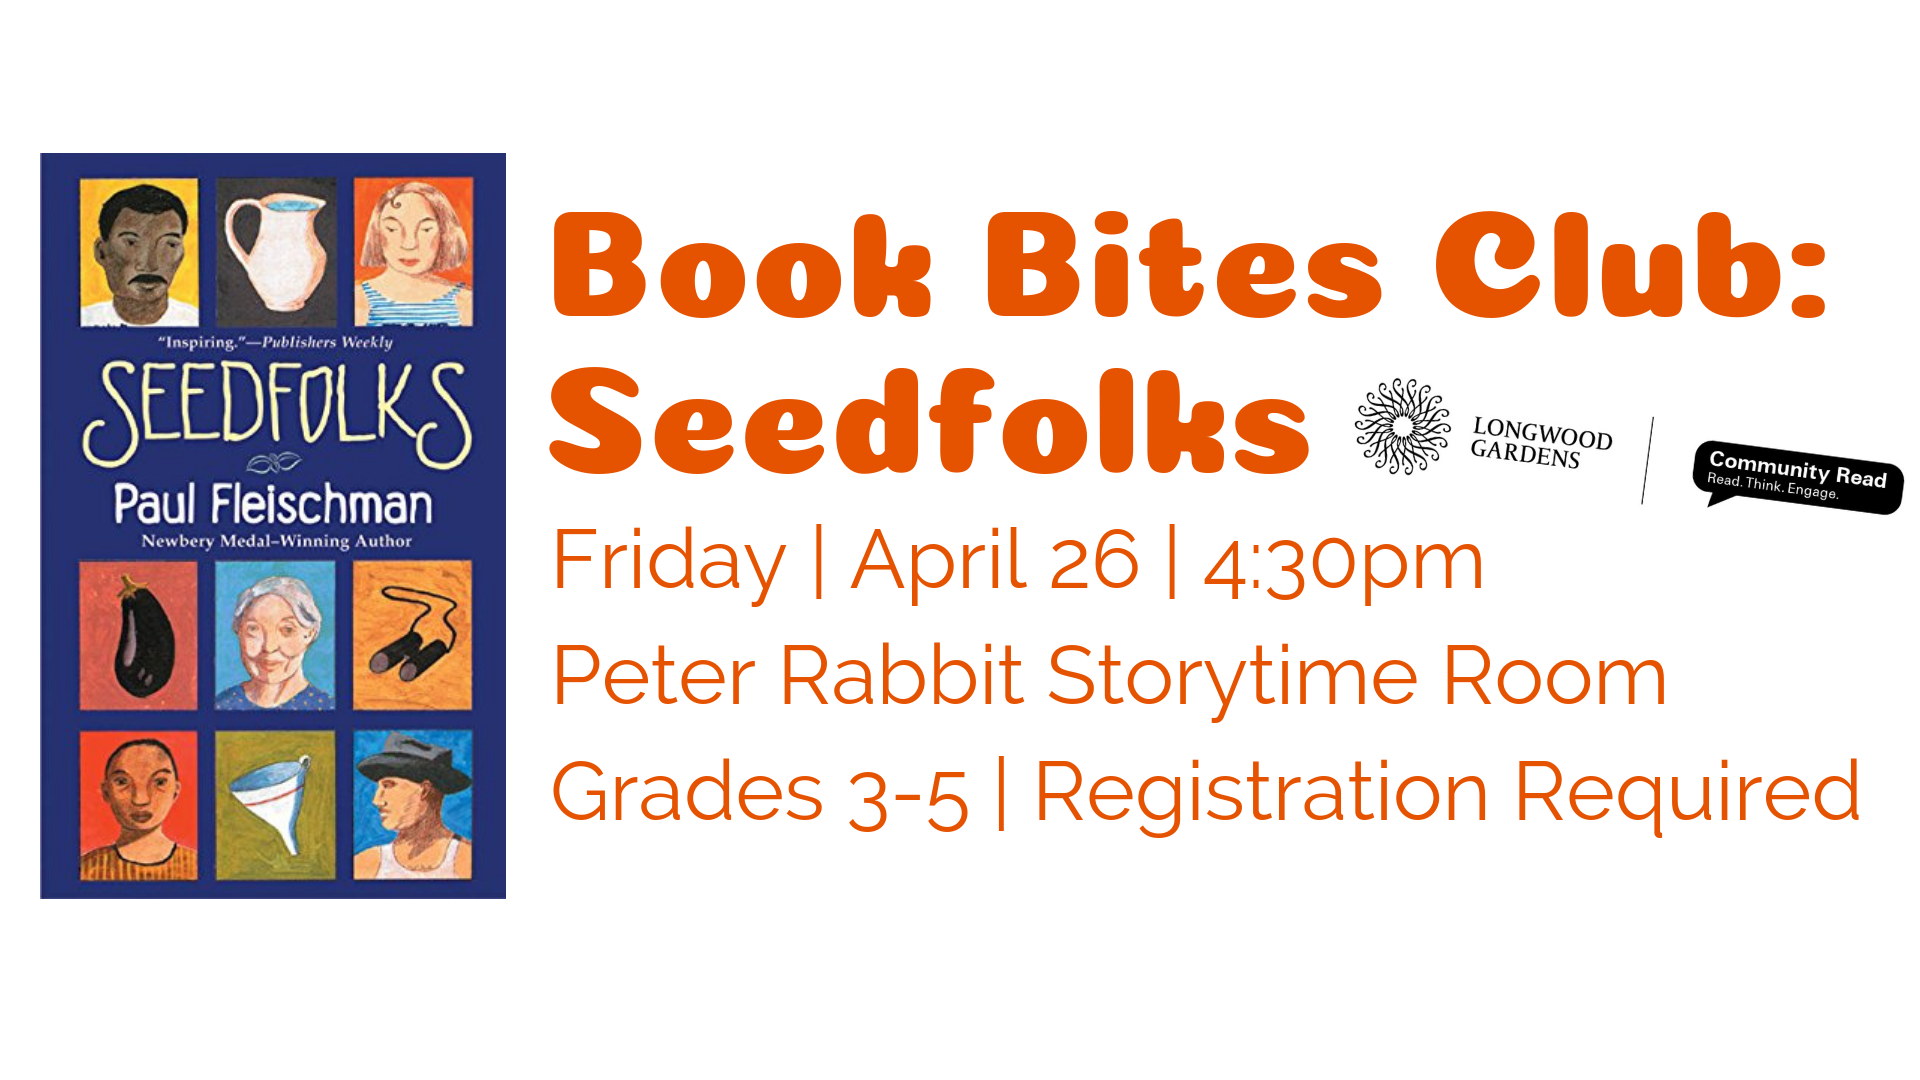 Book Bites Club: Seedfolks